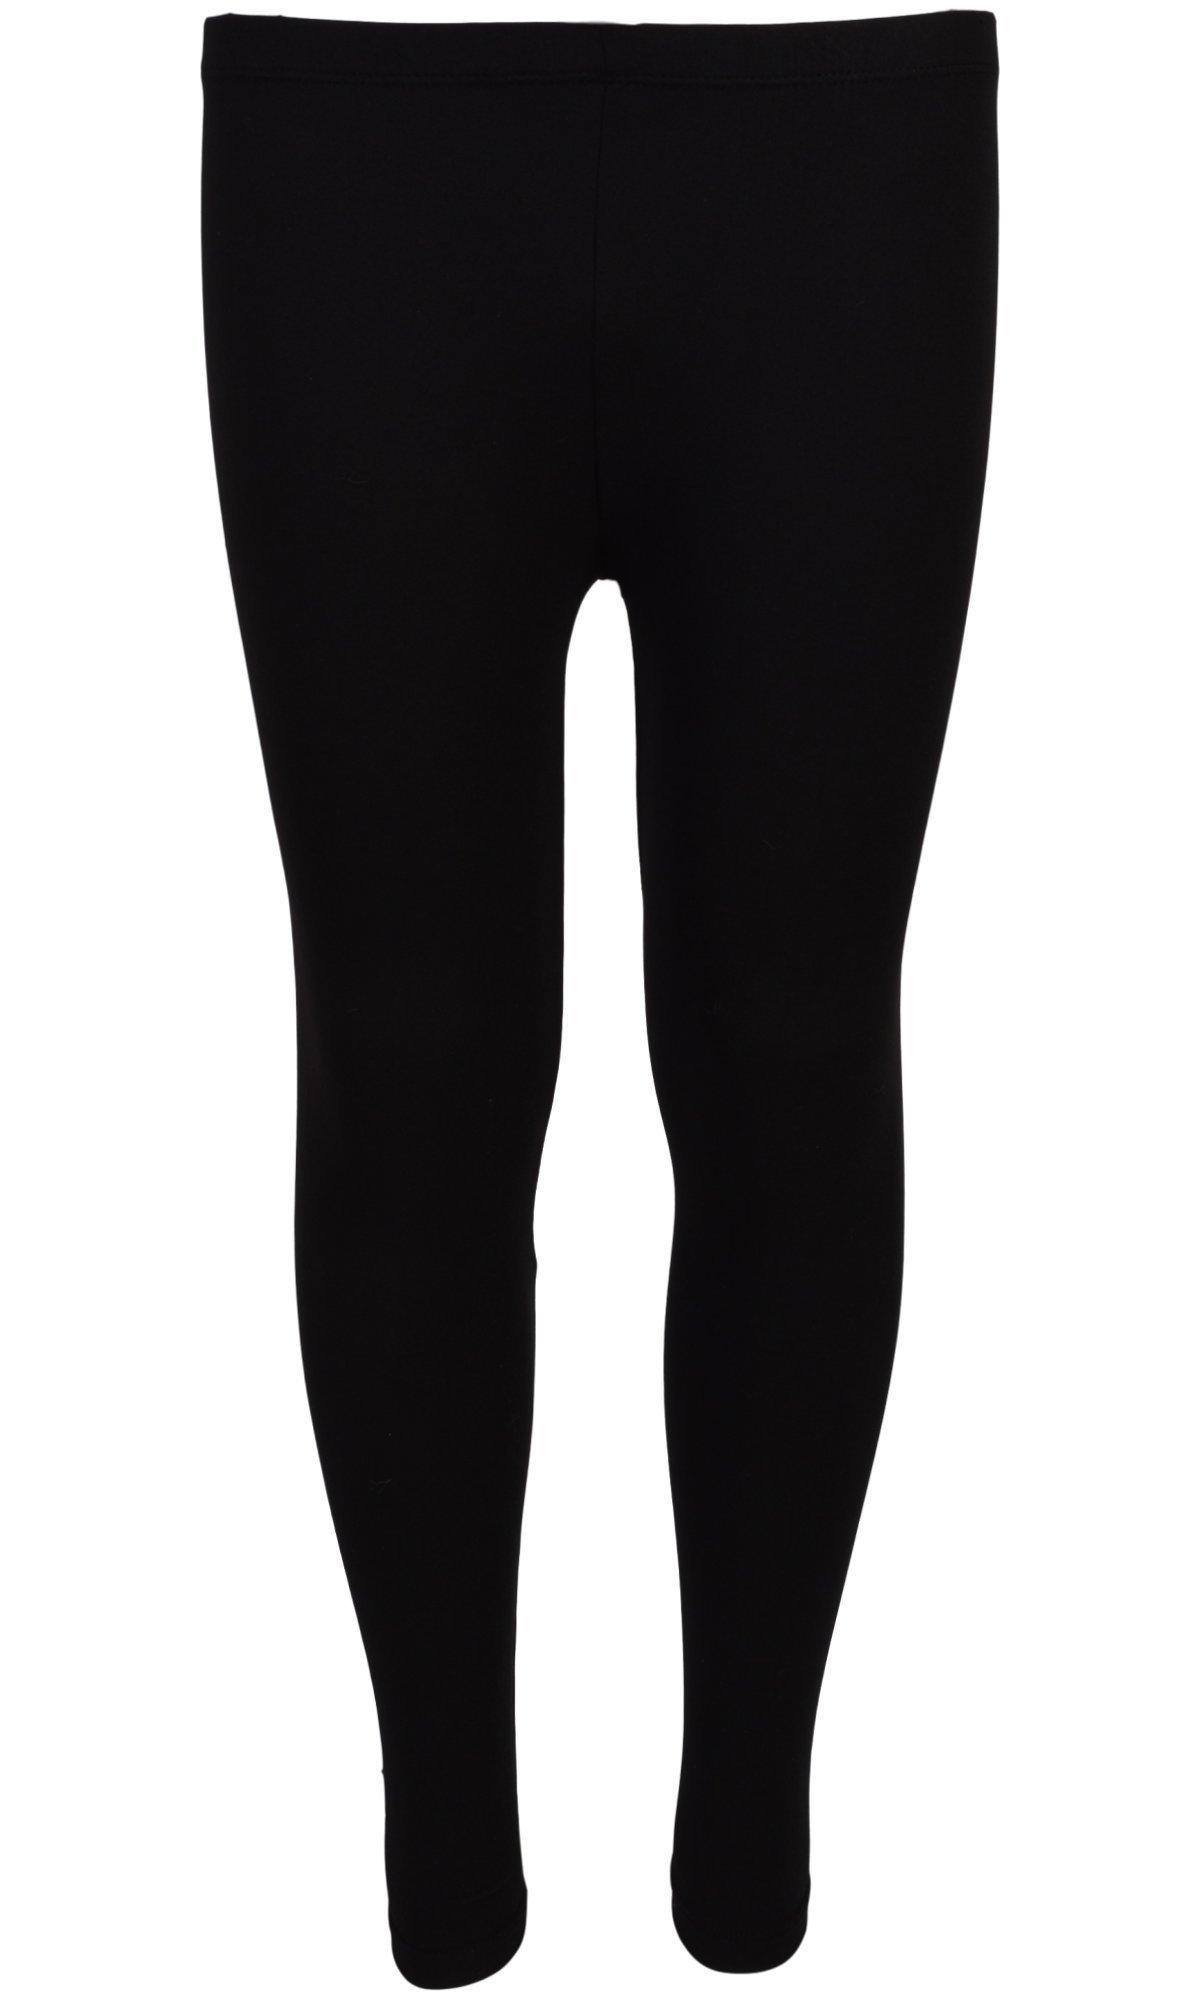 dELiA*s 'dELiAs 4 Pack Girl's Basic Yummy Active Leggings, Navy Flower/Diamond, Size 7/8' by dELiA*s (Image #2)